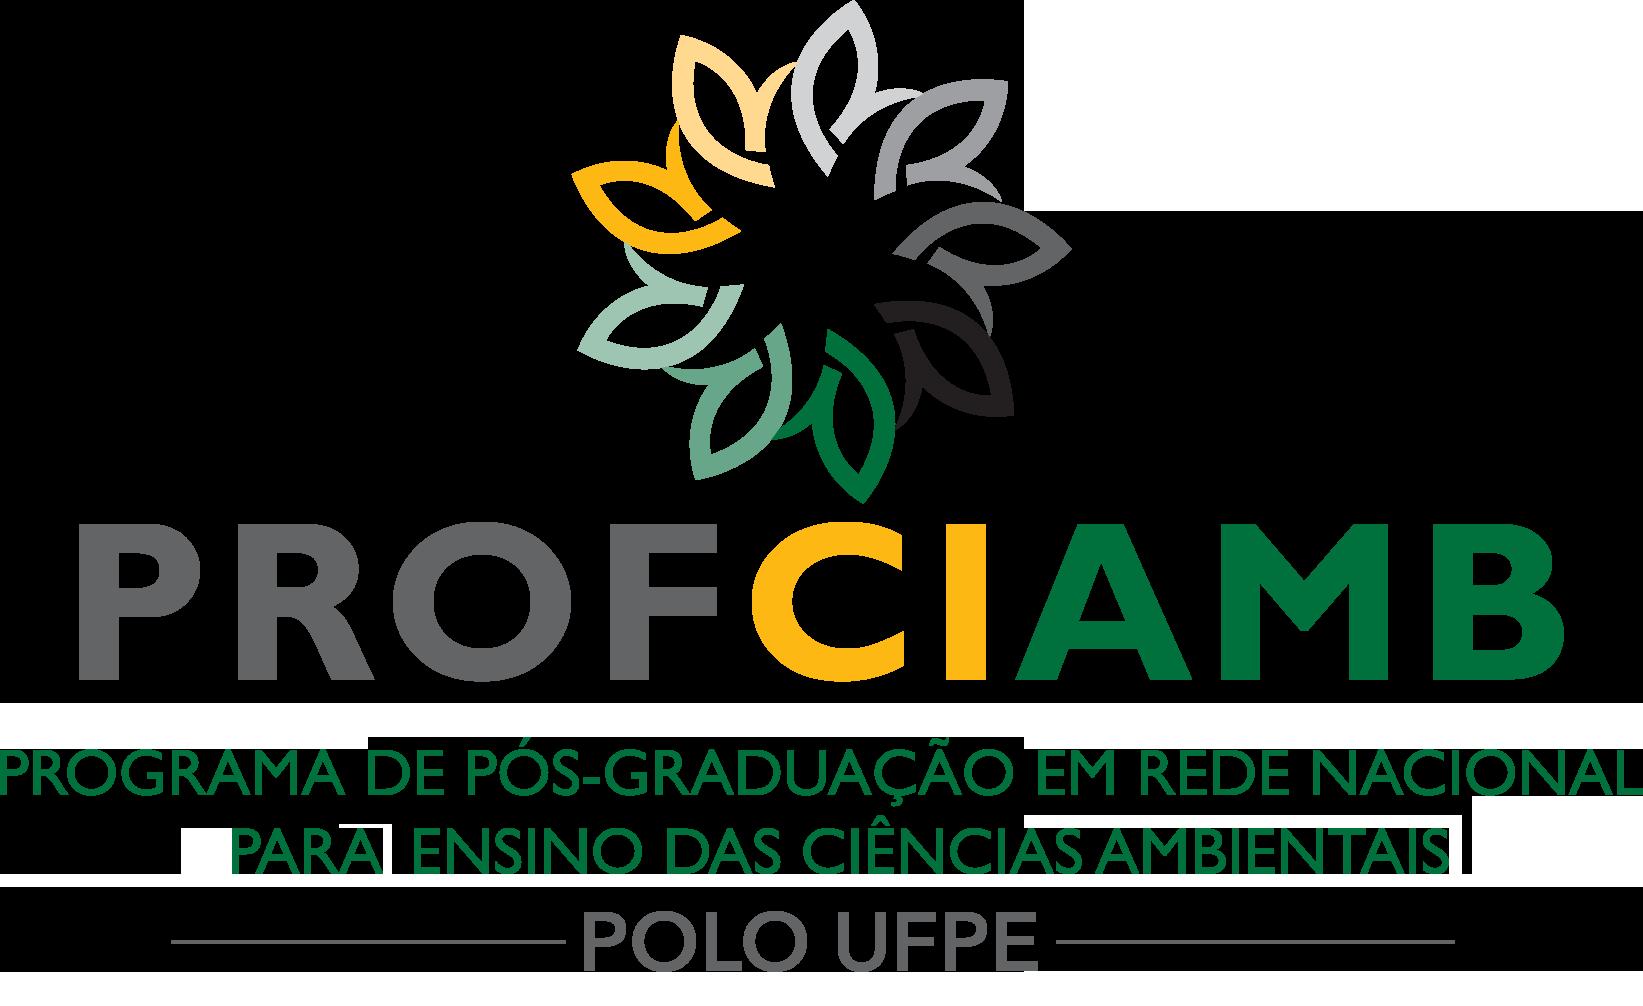 006-logo-profciamb